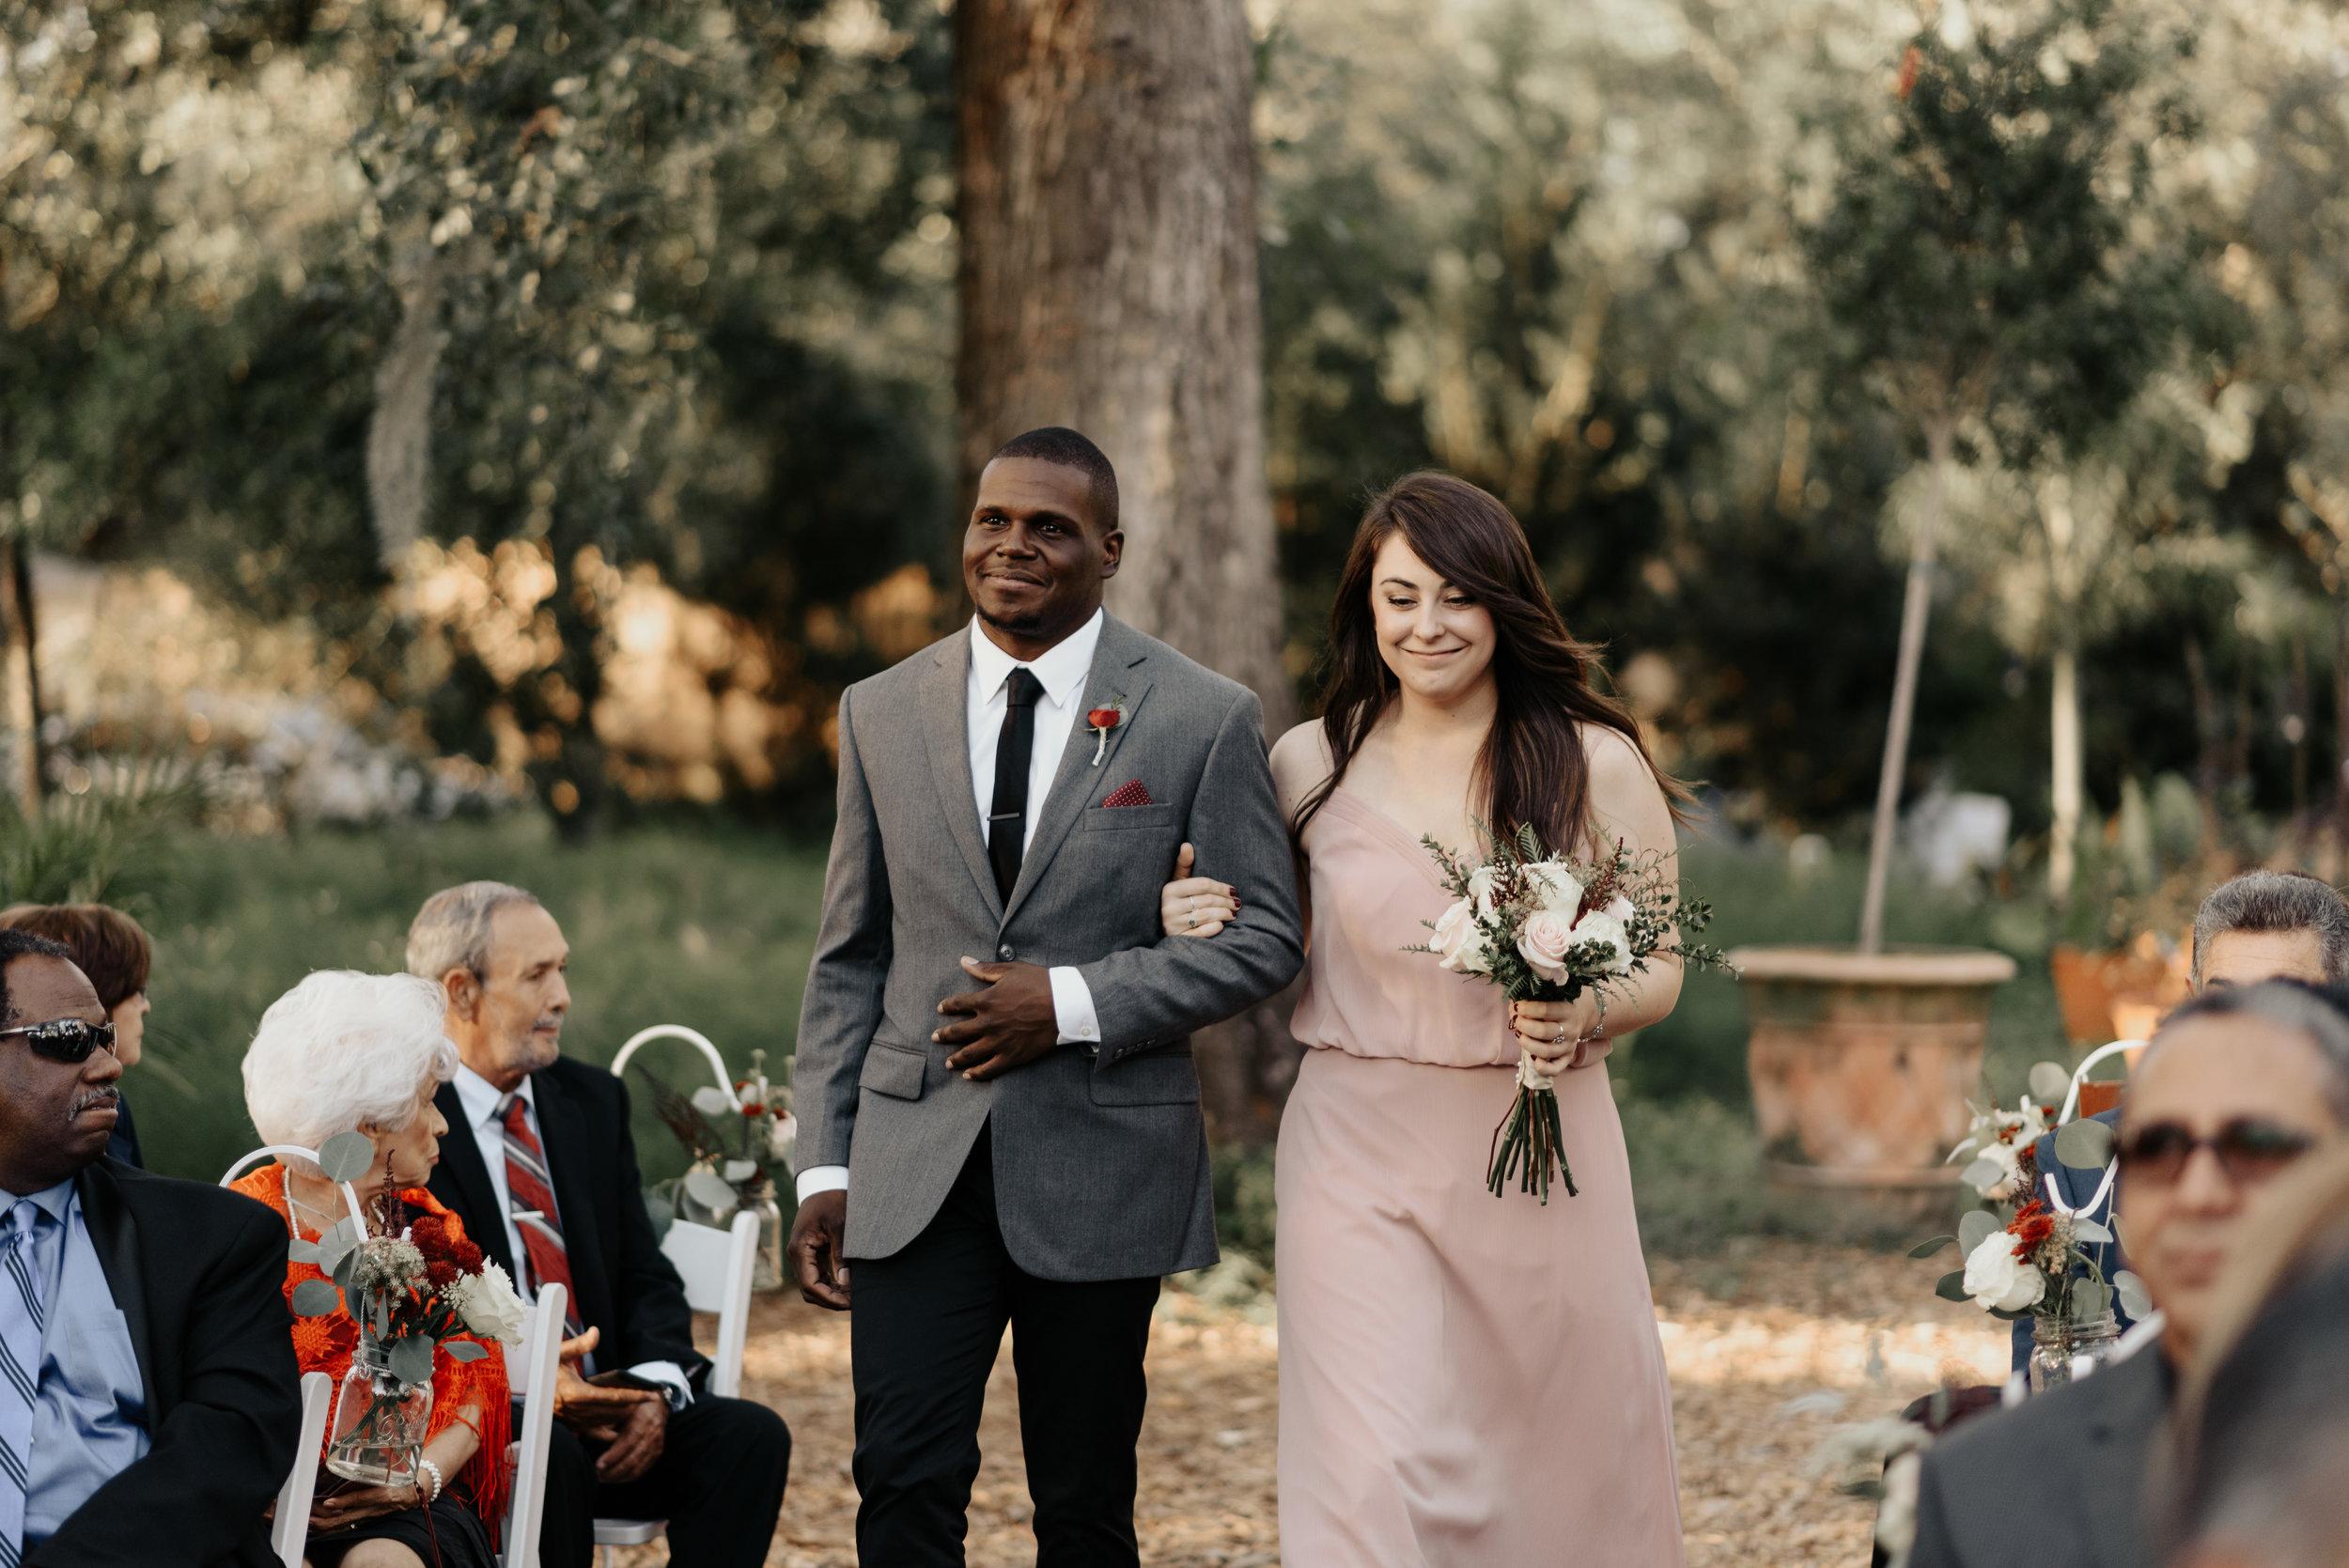 Kirstie-AJ-Wedding-9885.jpg